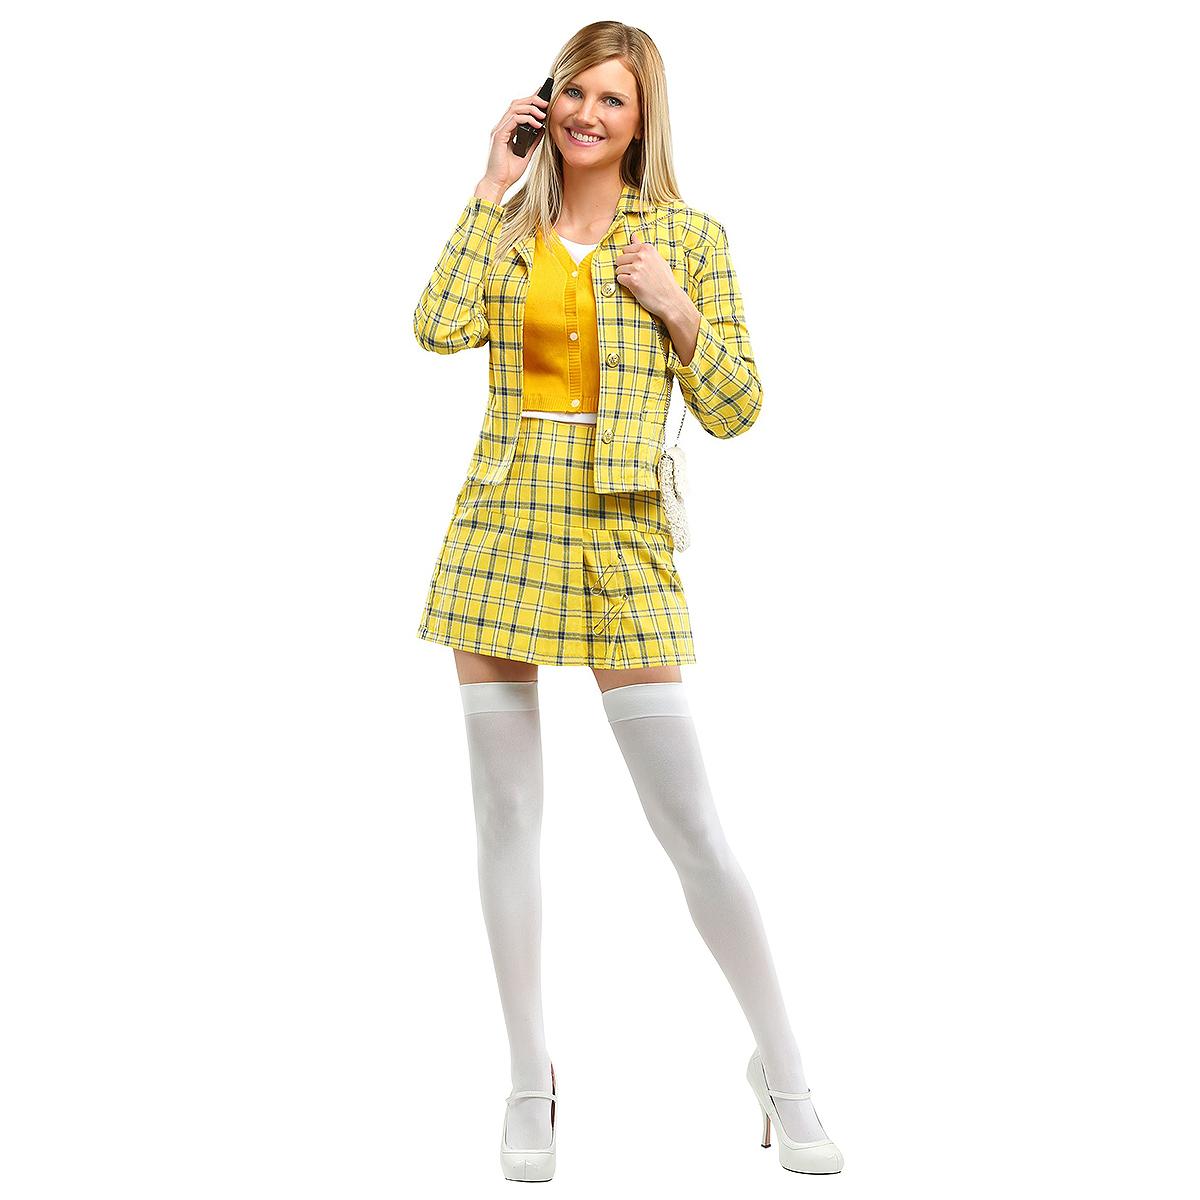 Cher Horowitz Clueless Halloween Costume